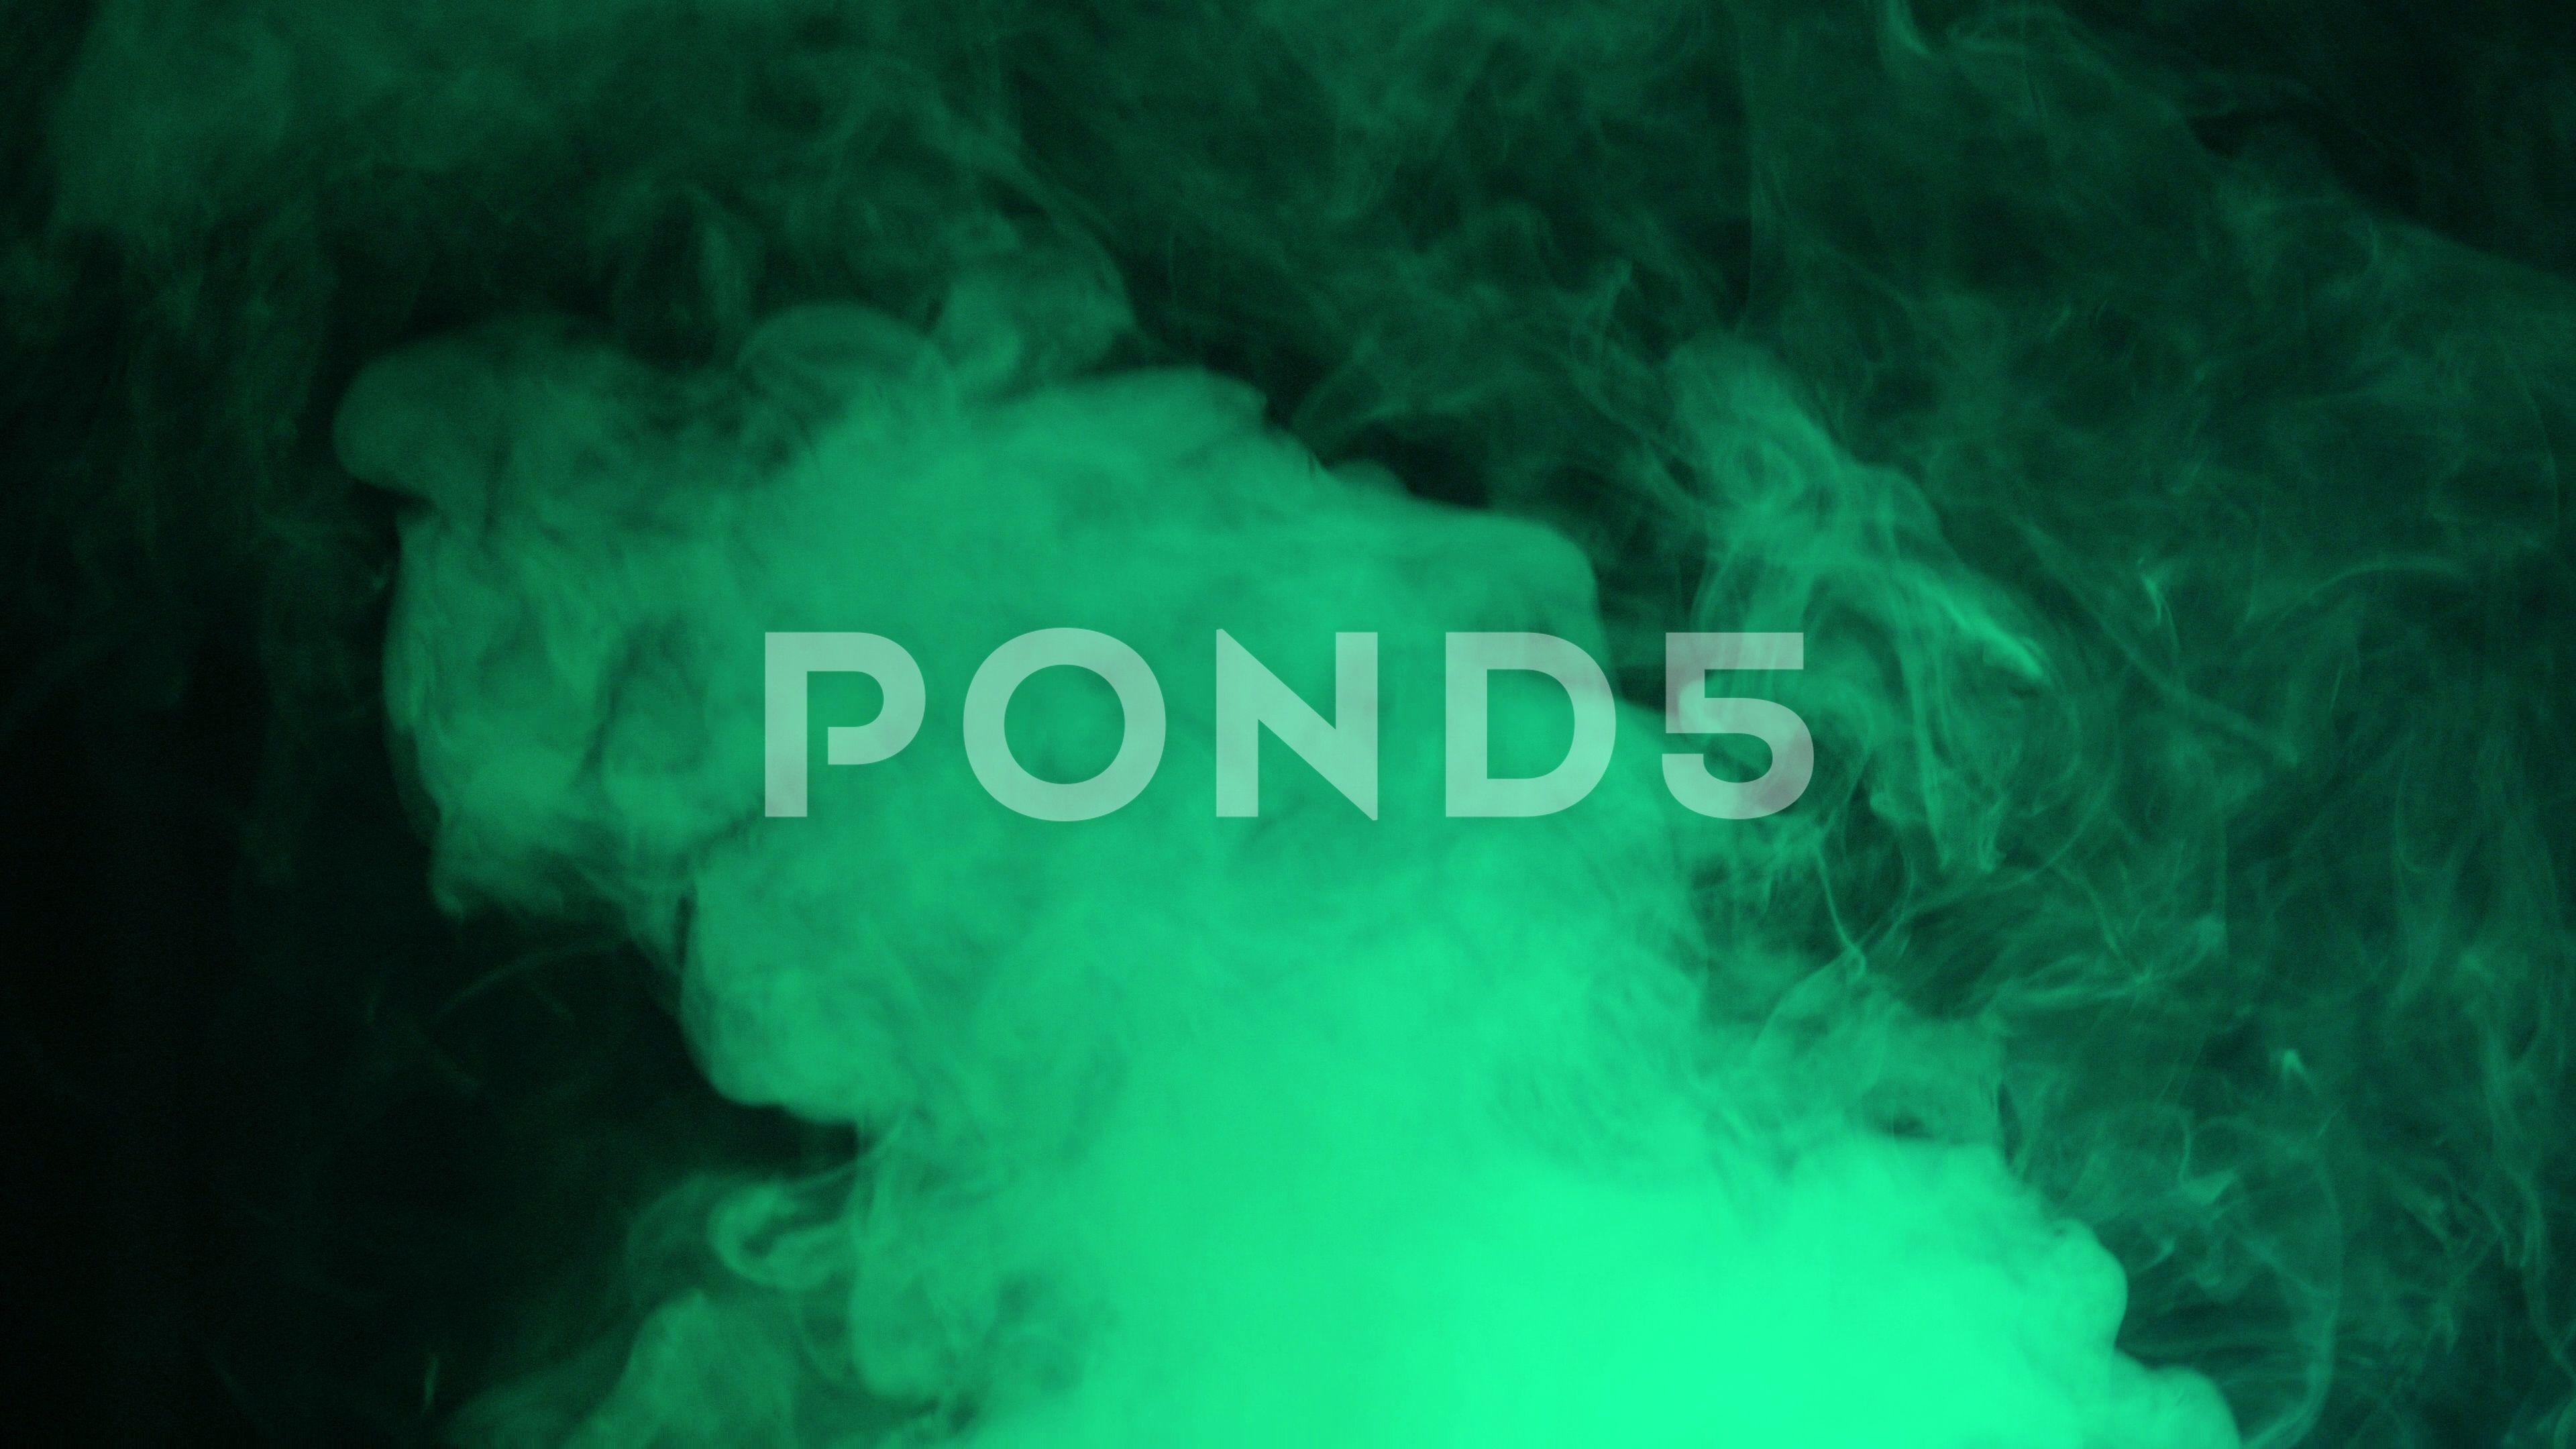 Green Puff Of Smoke Toxic Gas Background Cine 4k Ultra Hd Stock